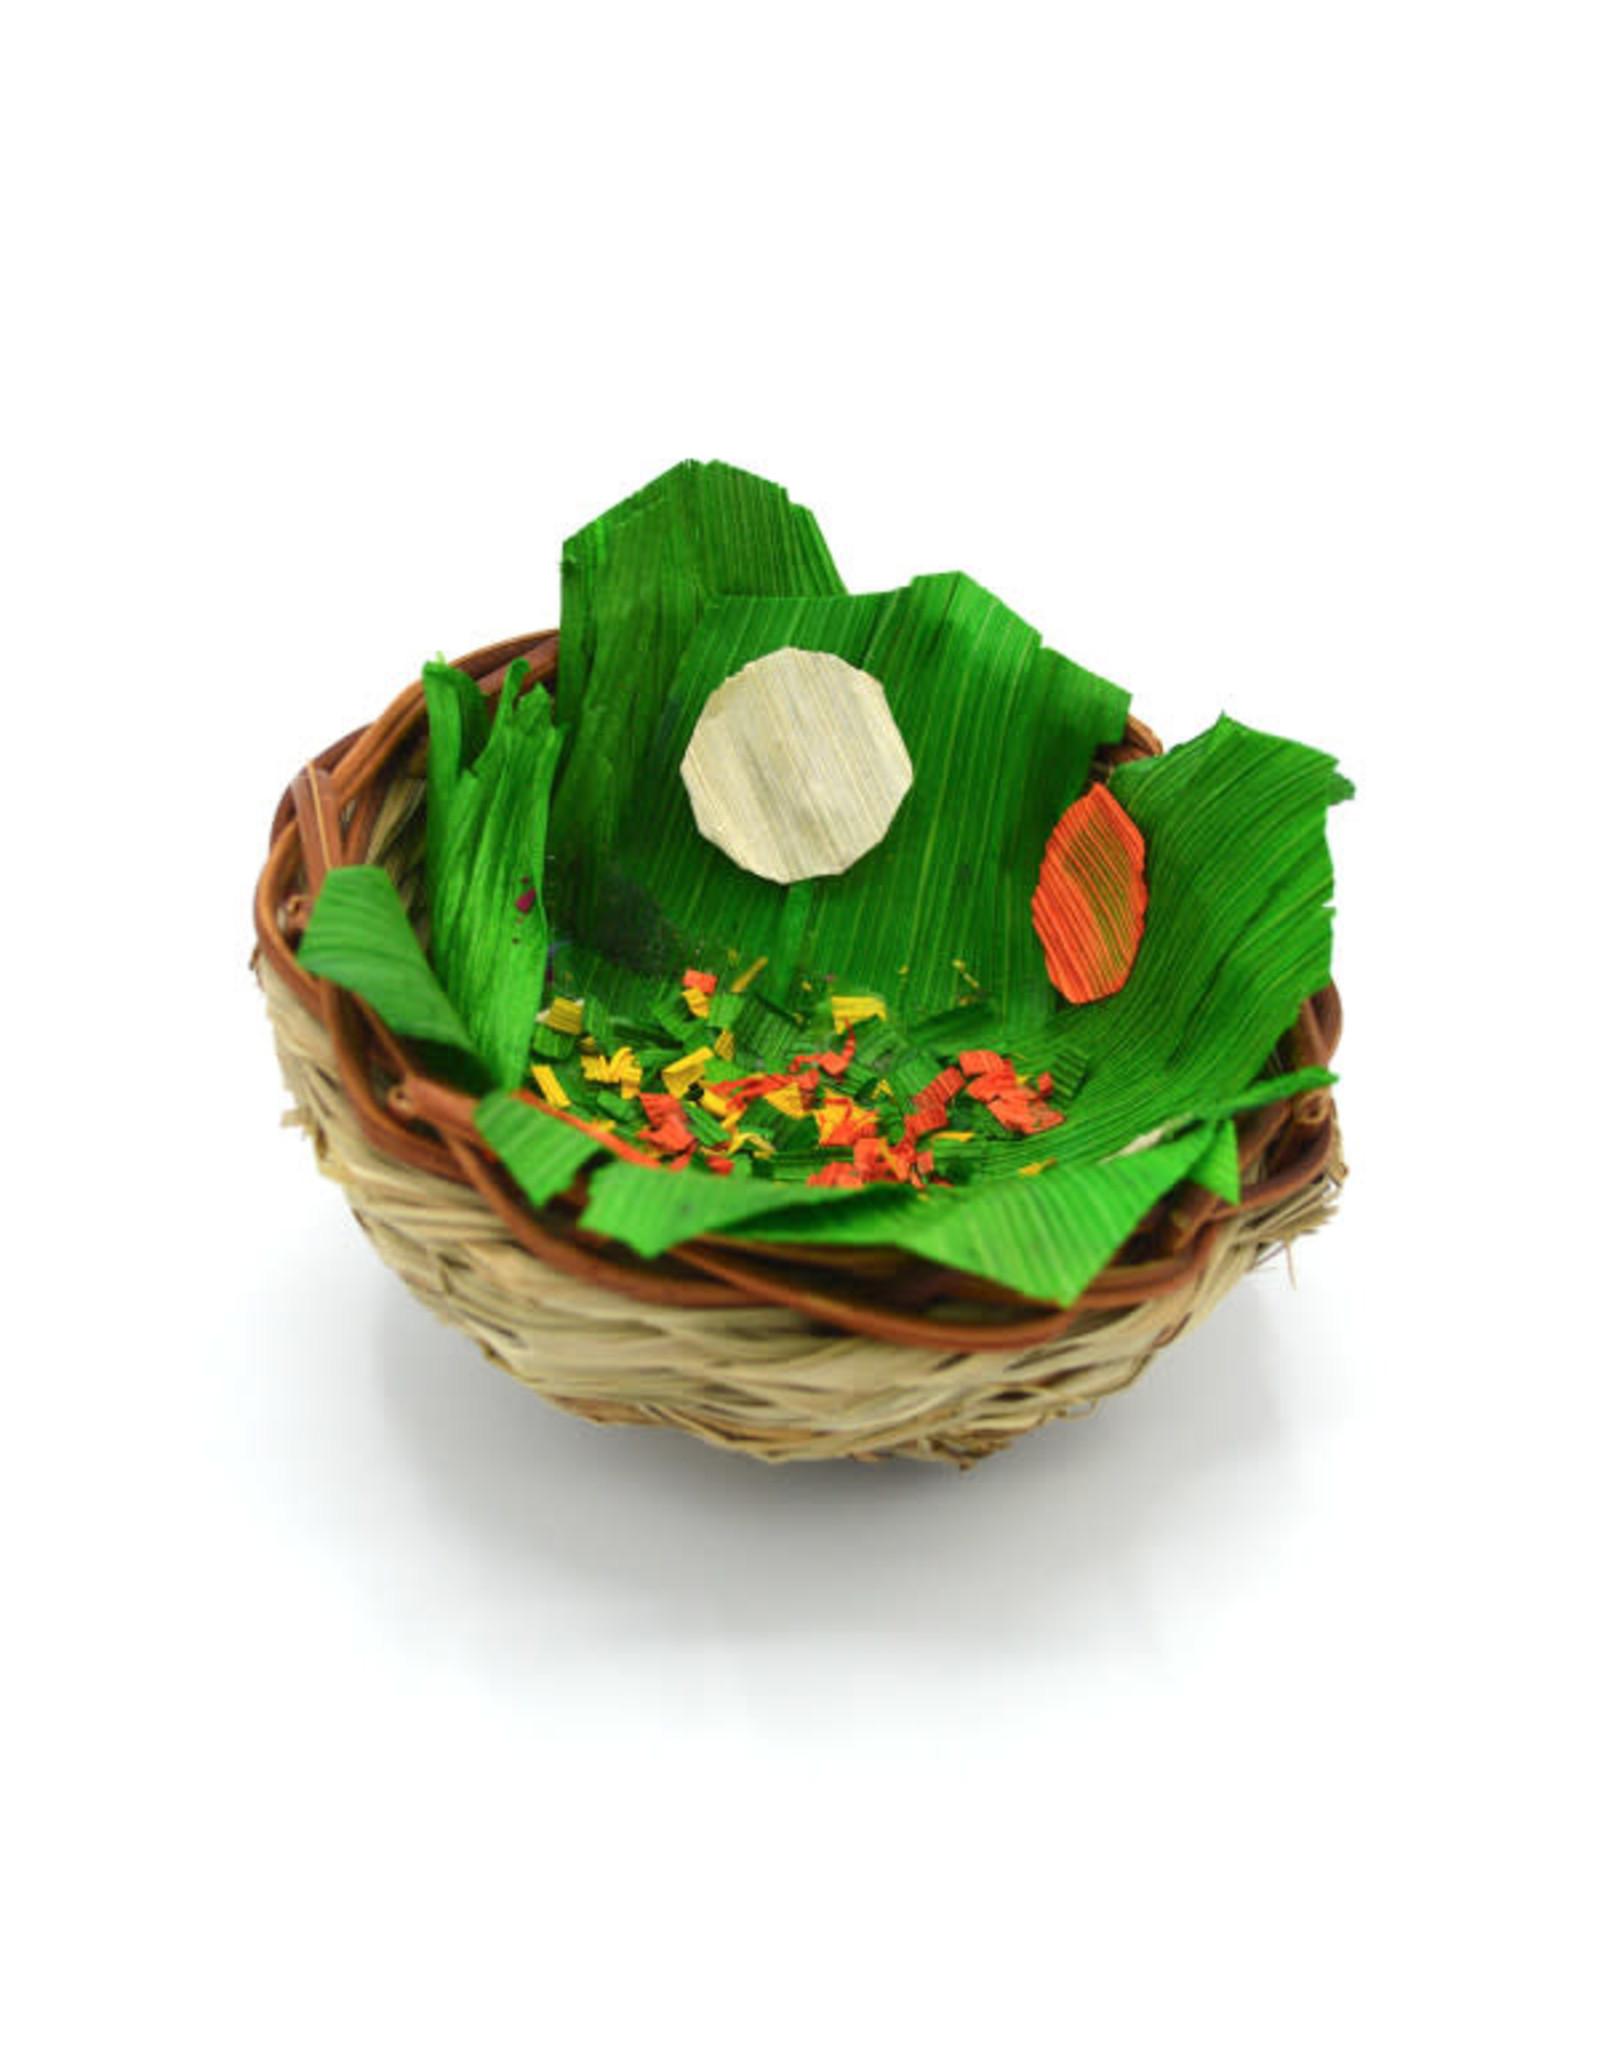 Oxbow Oxbow Enriched Life Celebration Salad